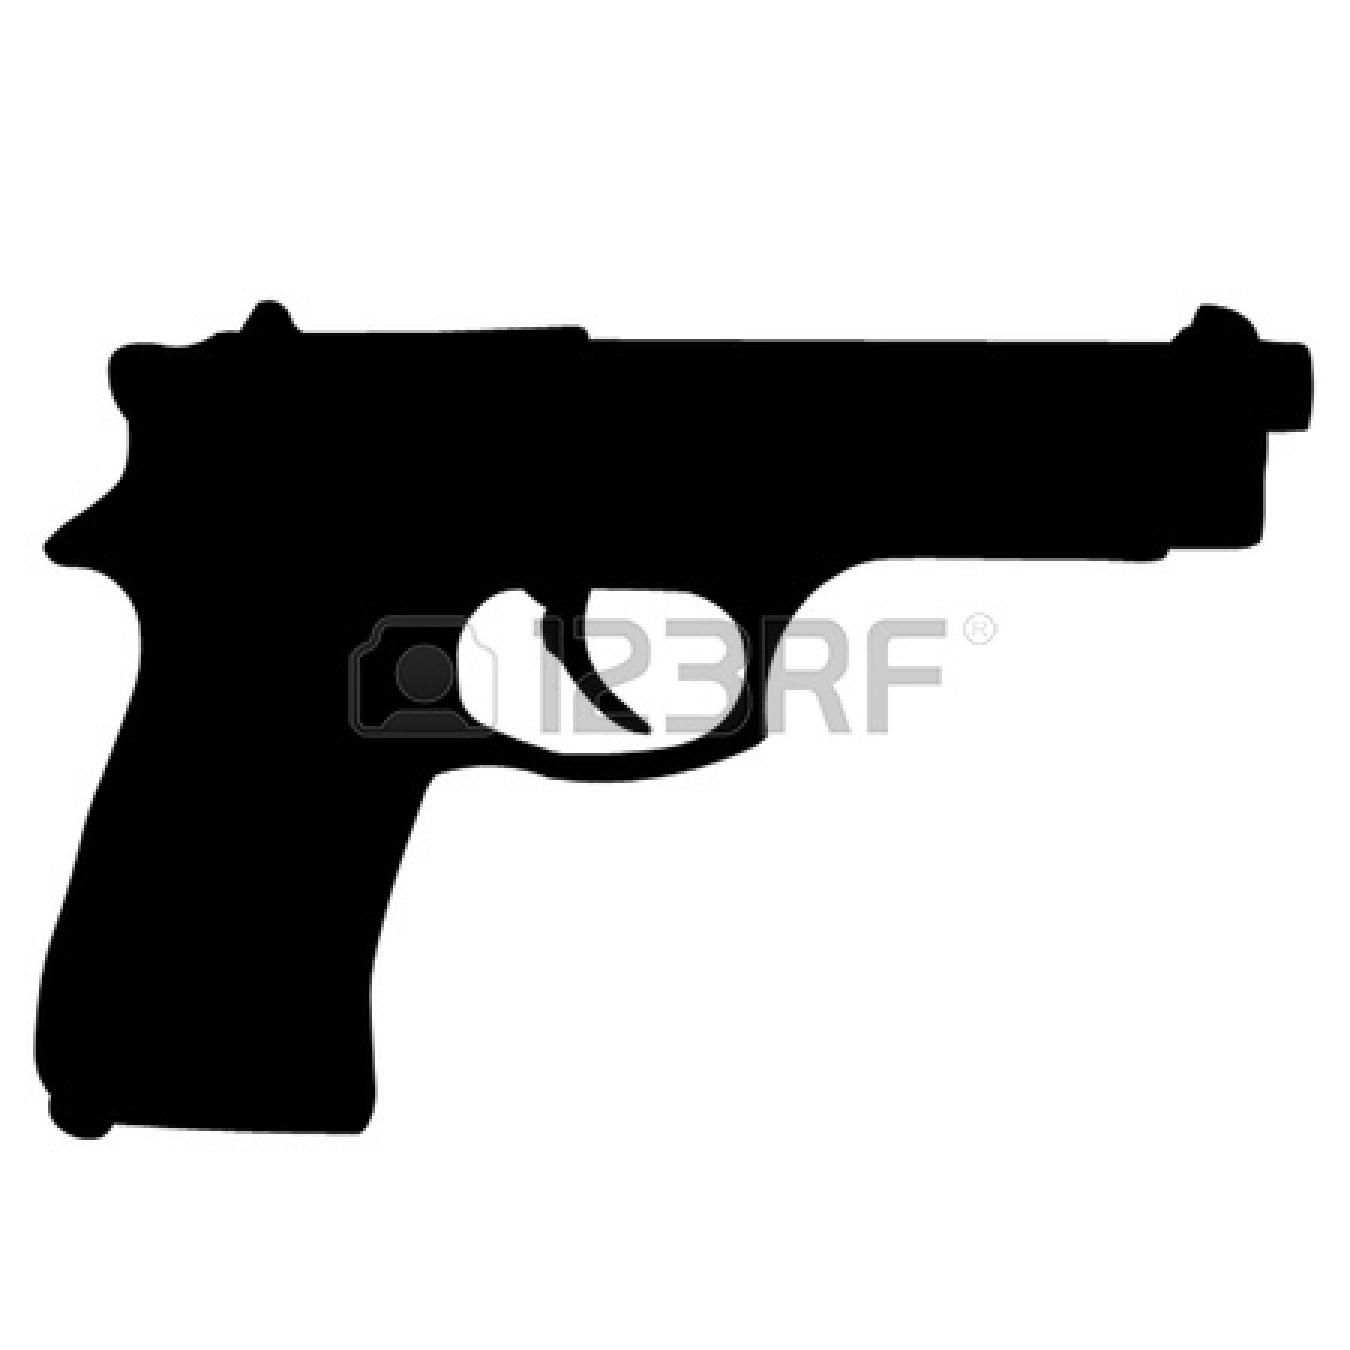 Shooting Gun Clipart 12066190 Gun Jpg-Shooting Gun Clipart 12066190 Gun Jpg-15